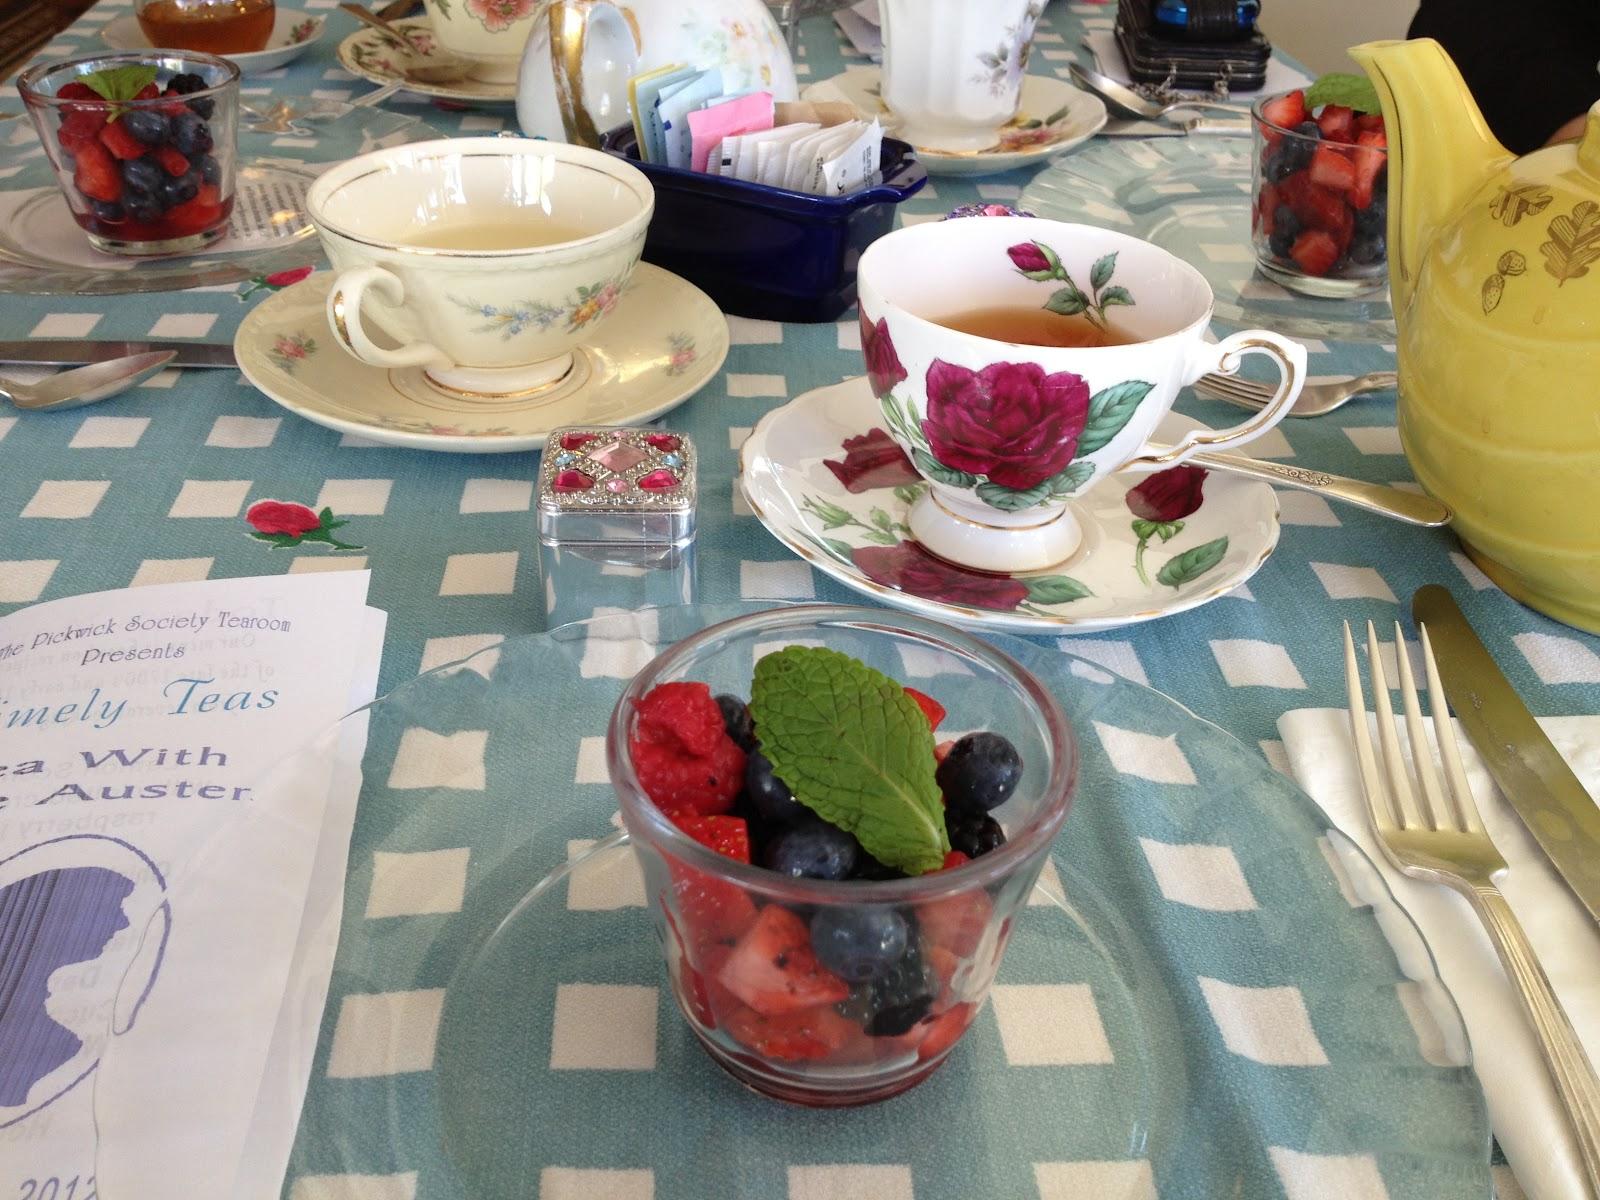 Pickwick Society Tea Room